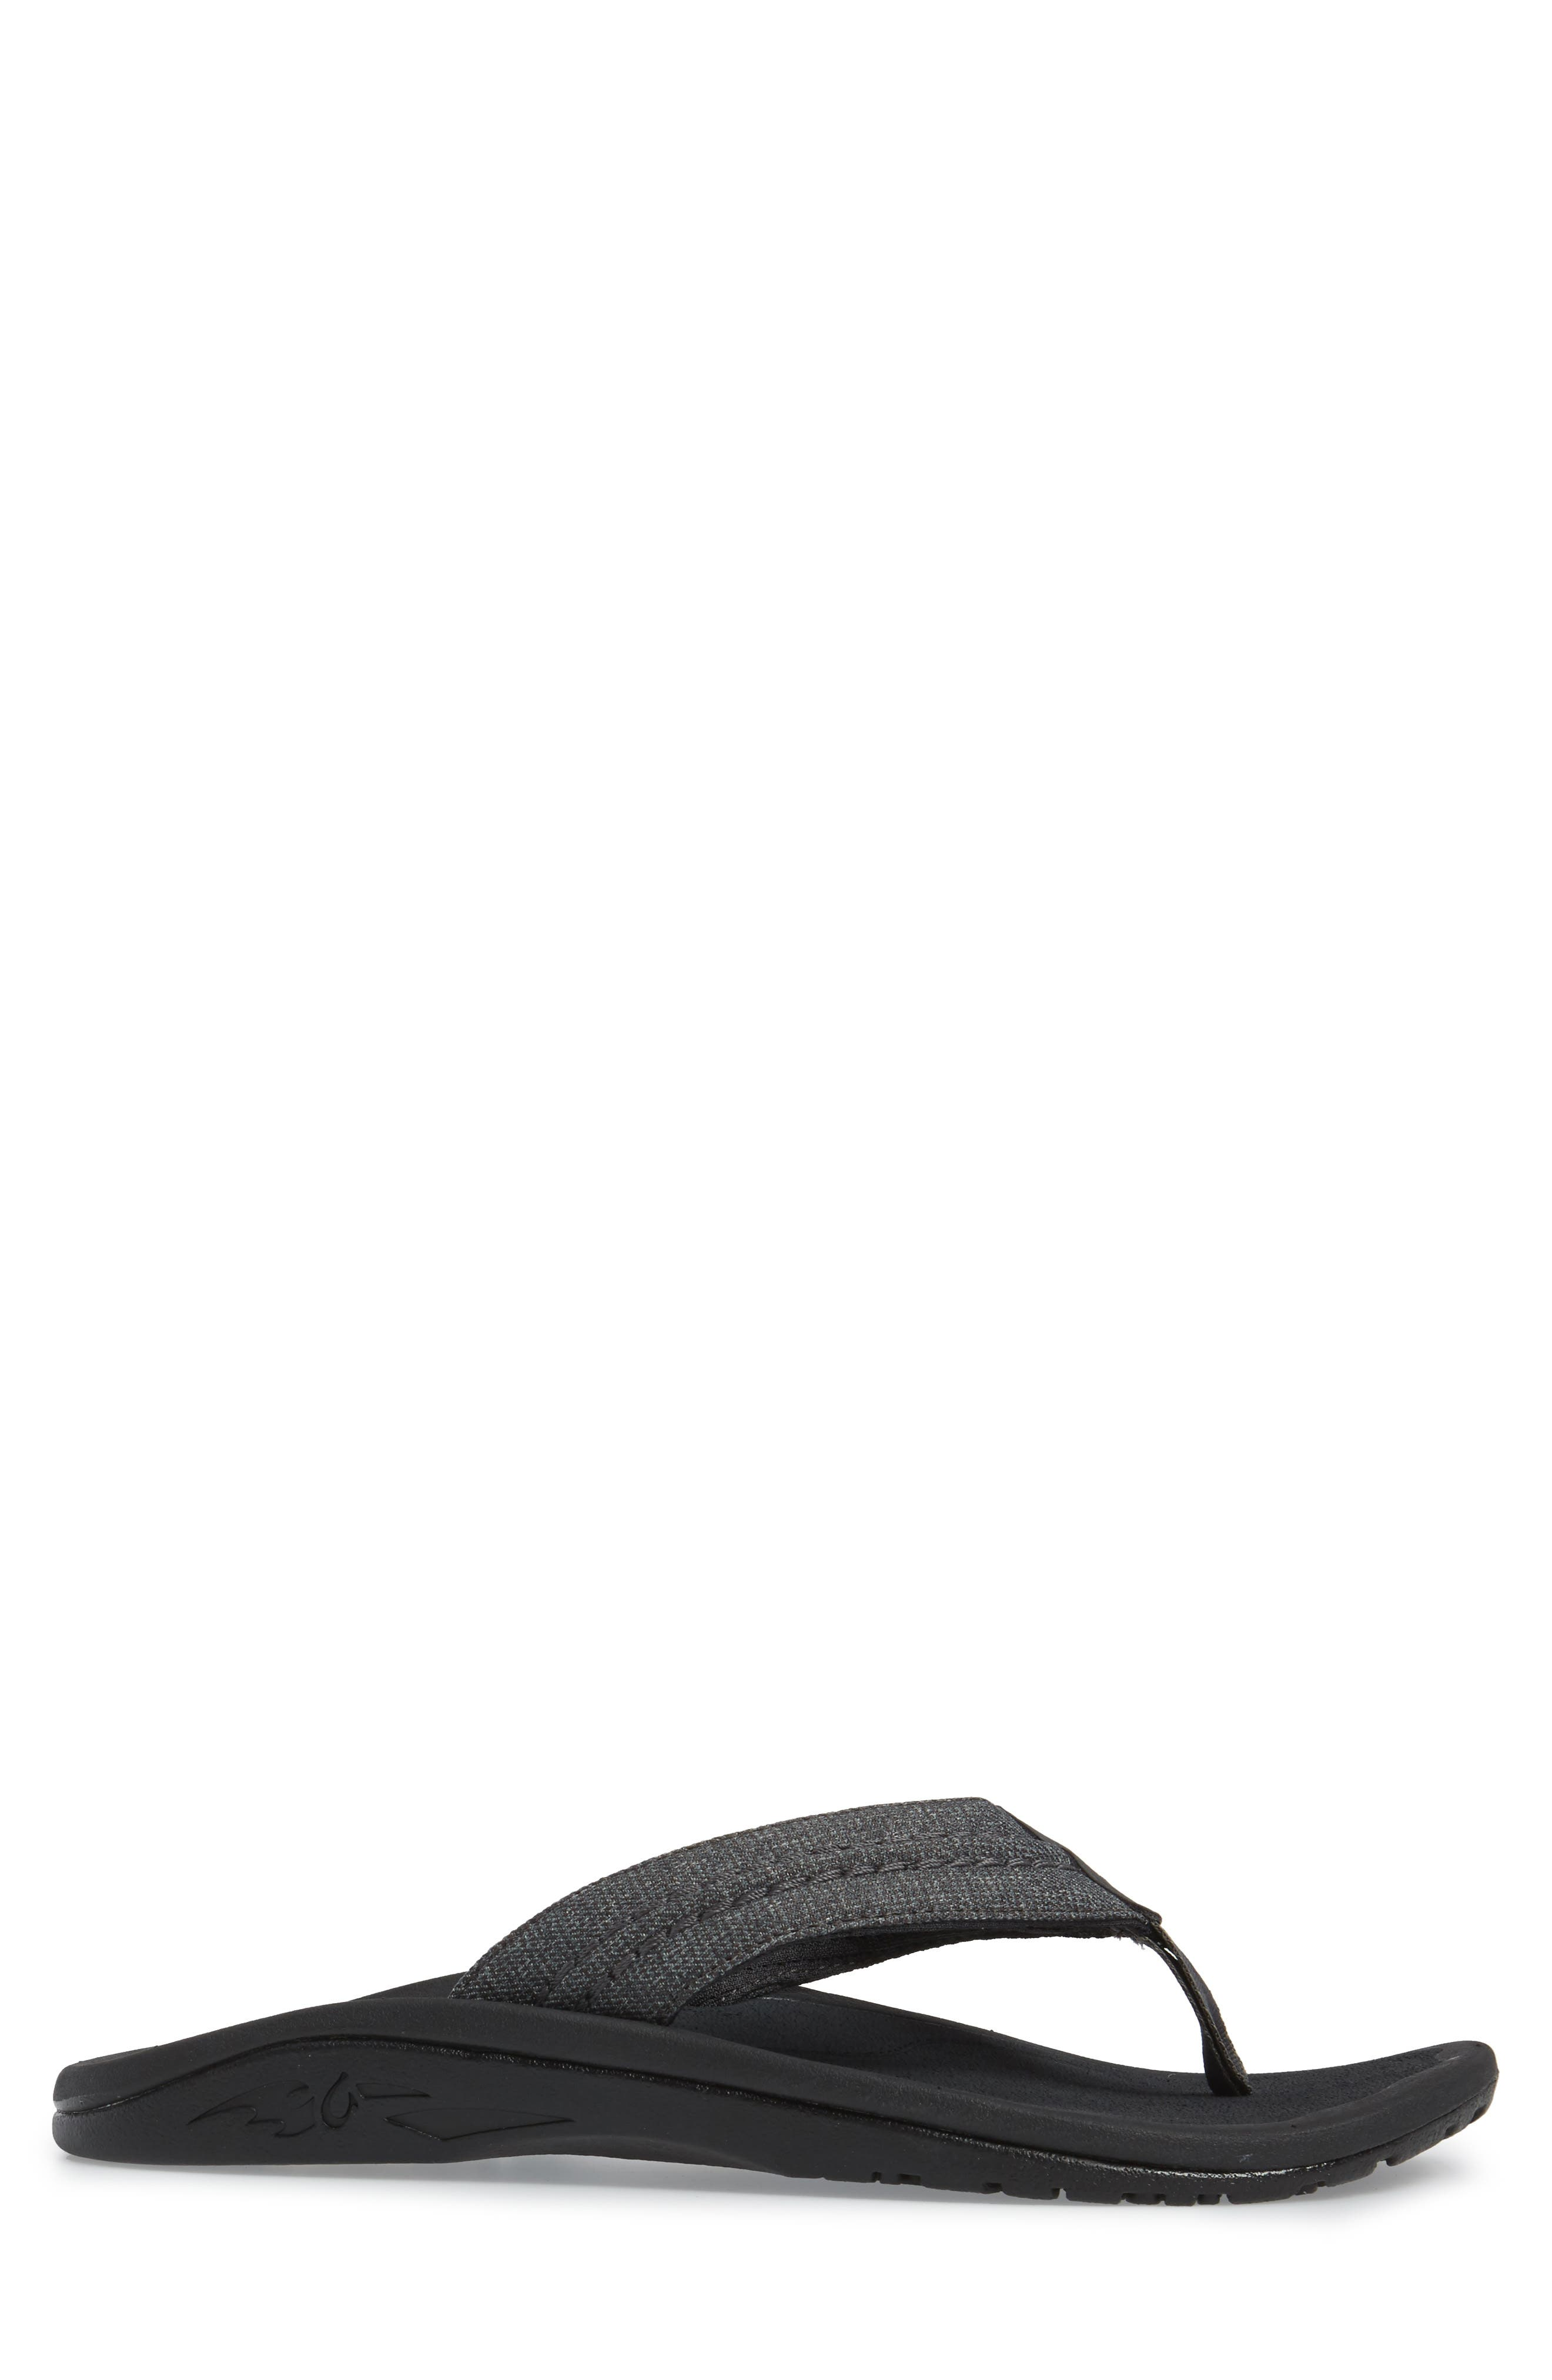 OLUKAI, Hokua Flip Flop, Alternate thumbnail 3, color, DARK SHADOW/ DARK SHADOW